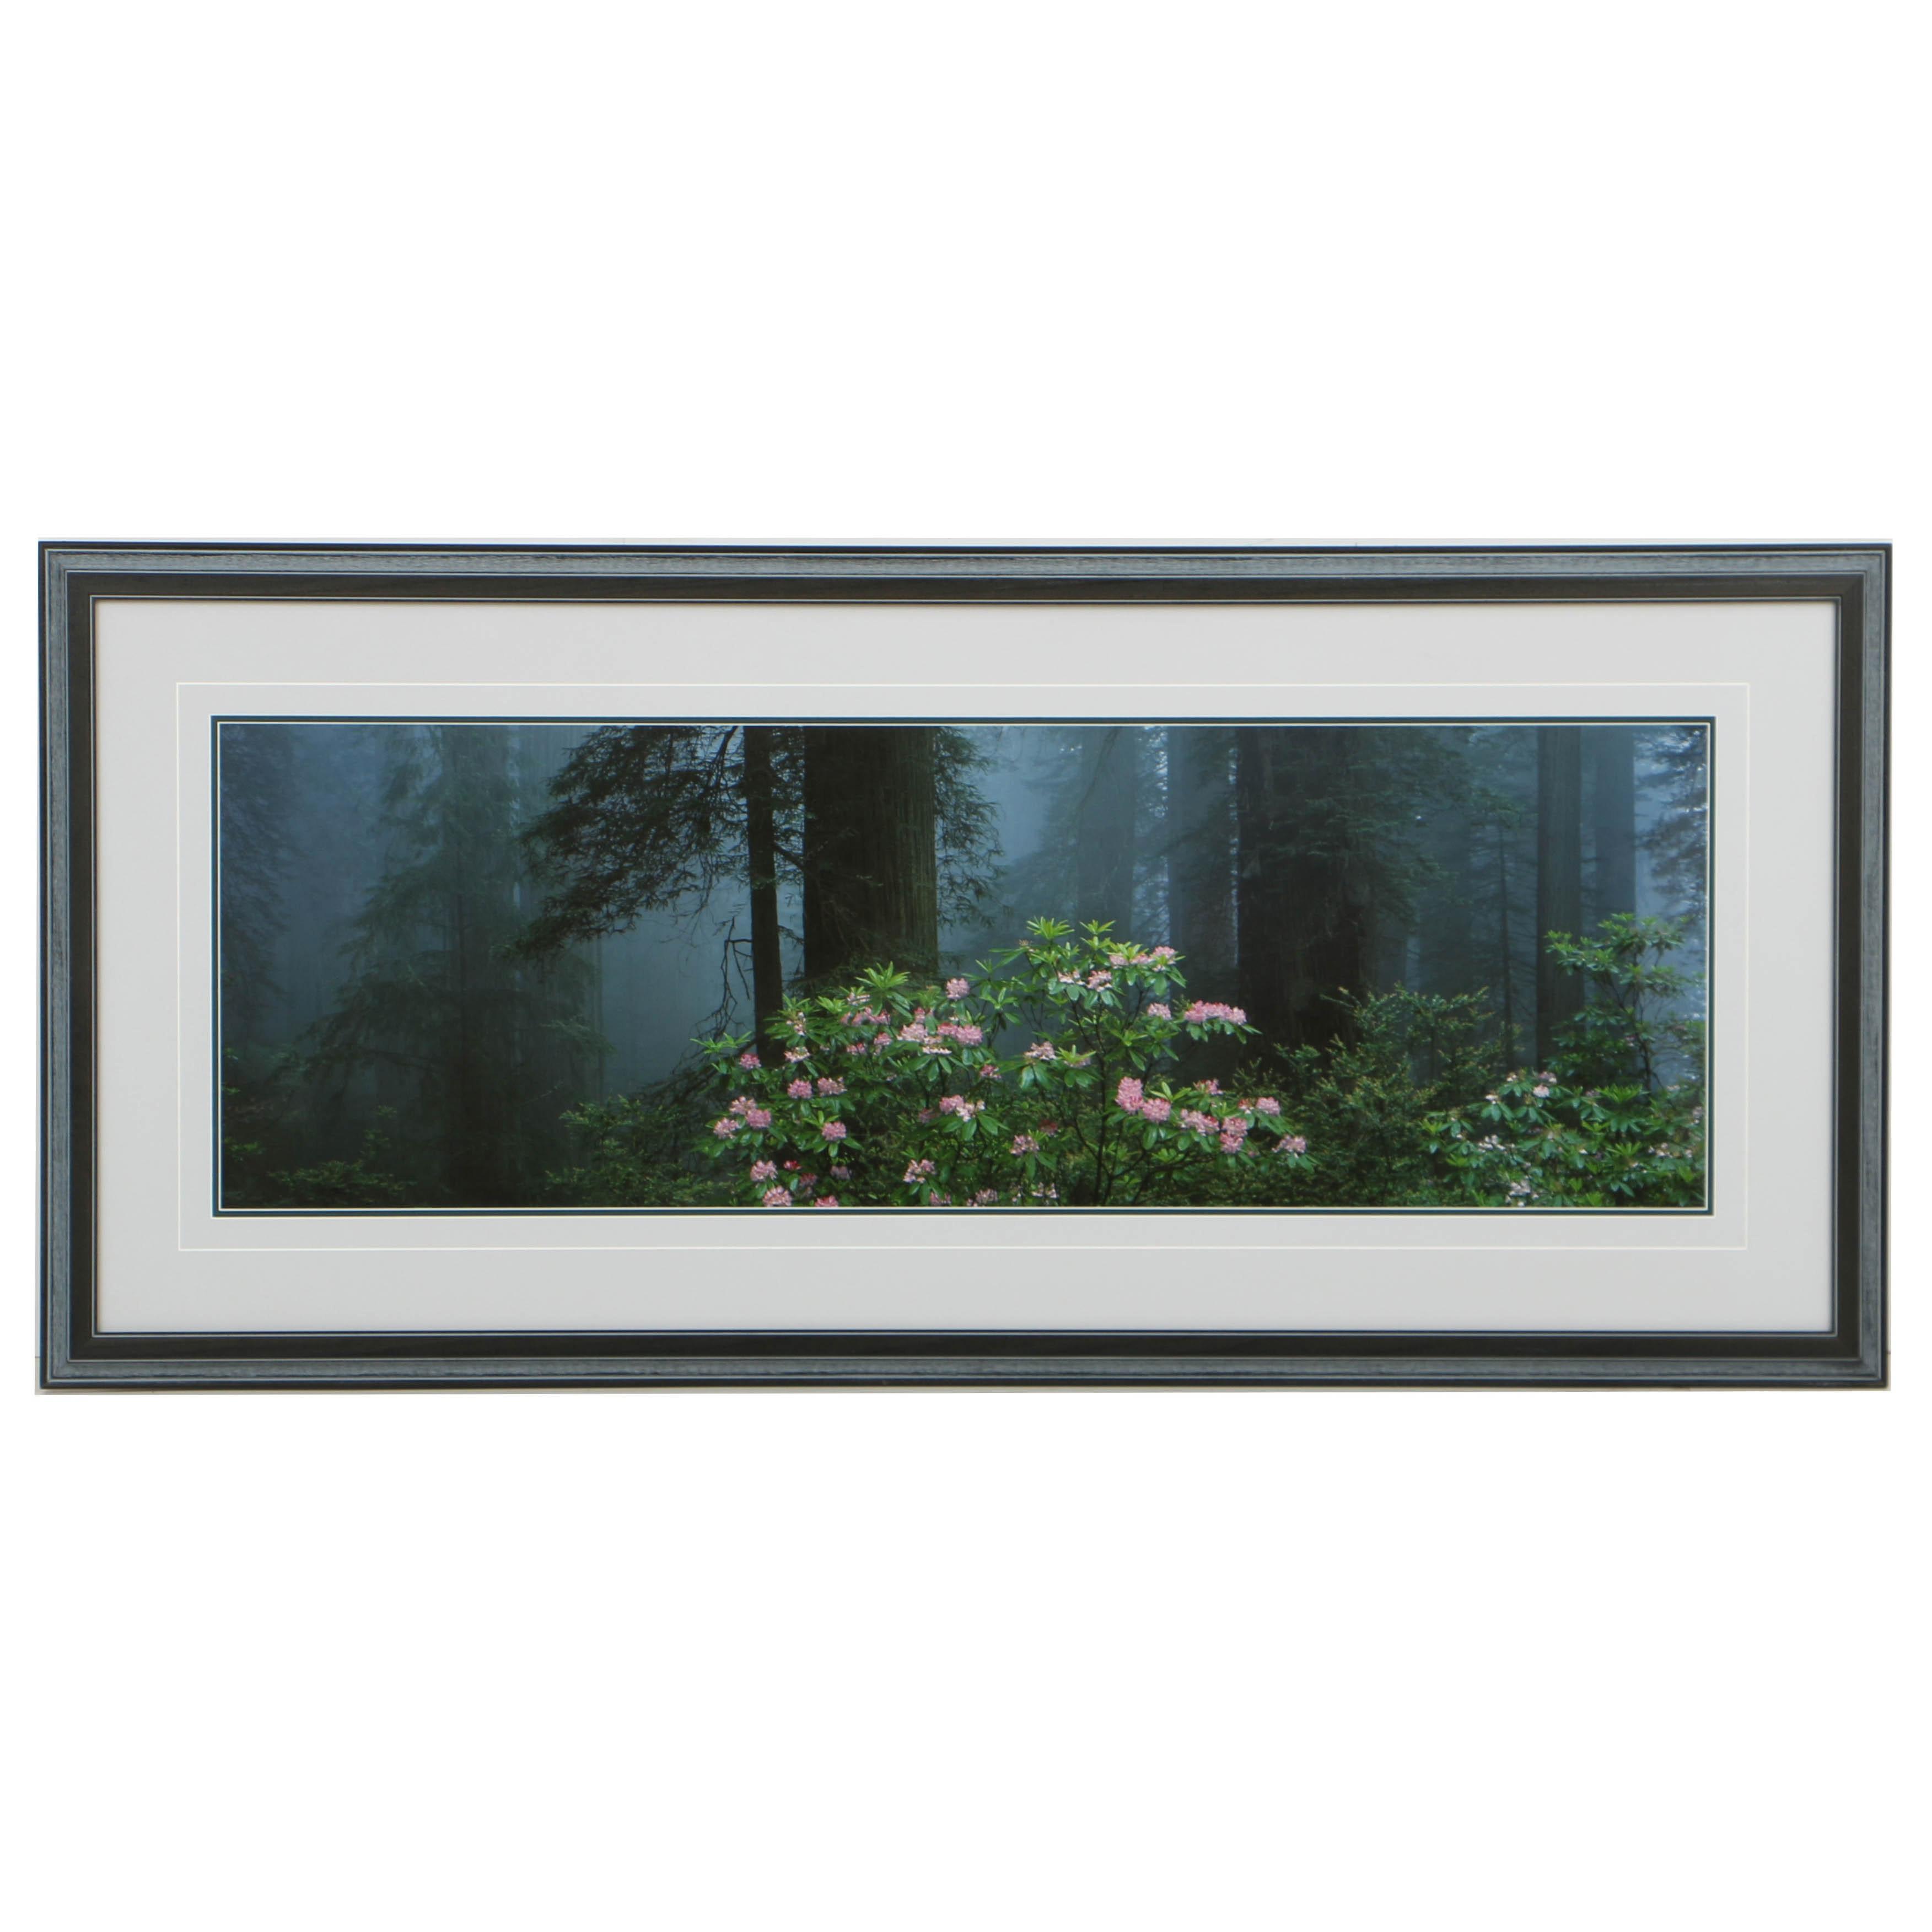 Thomas D. Mangelsen Panoramic Color Photograph of Forest Landscape